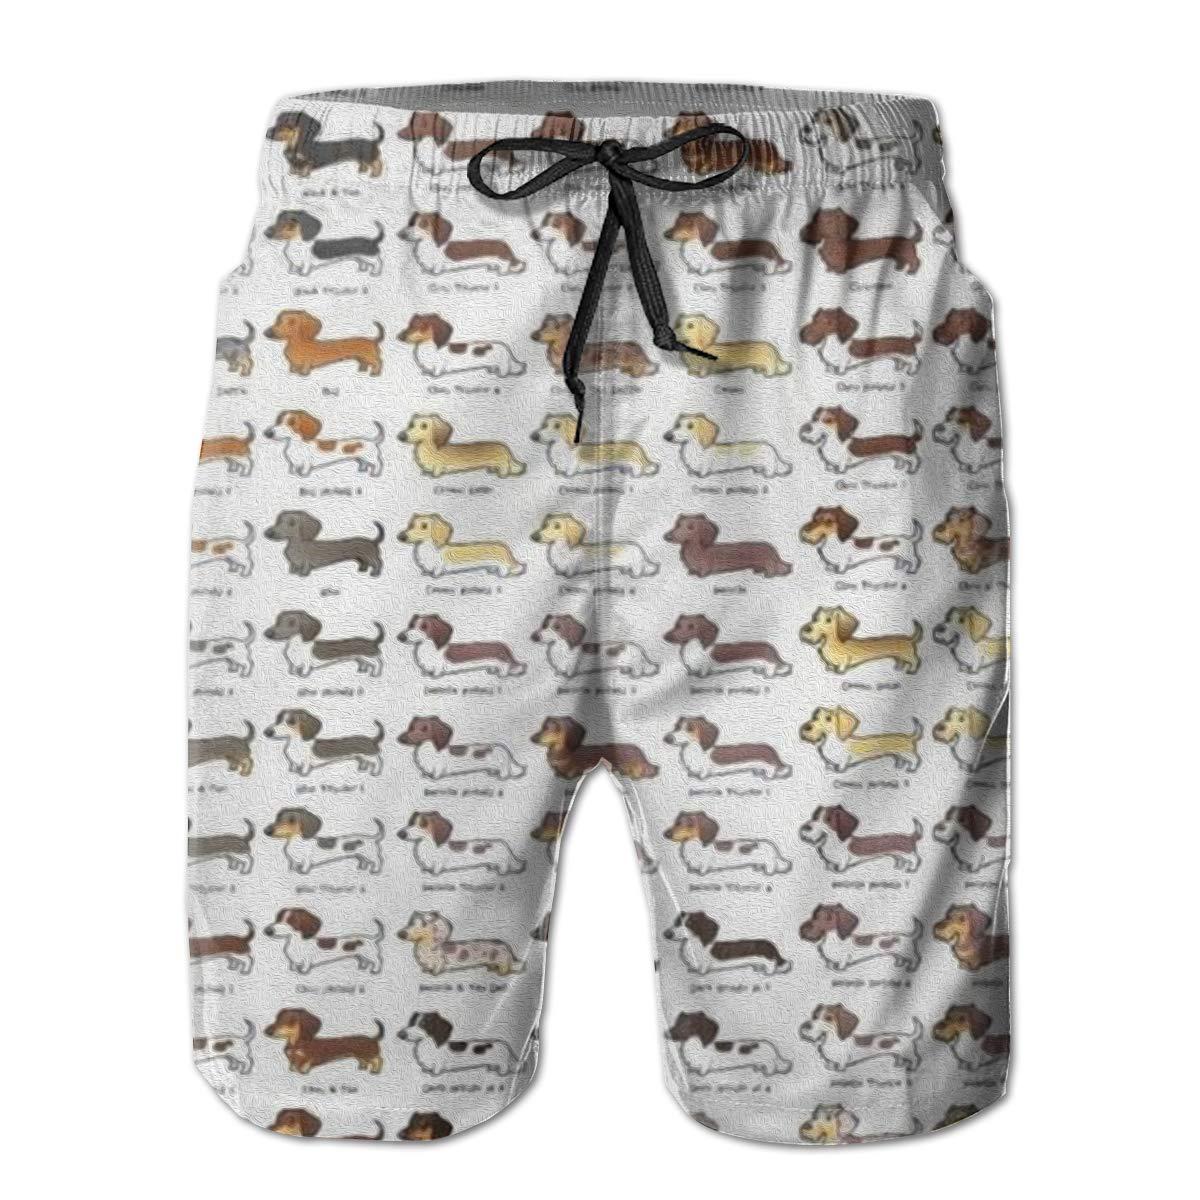 FUNSTYEET Dachshund Pattern Mens Board Shorts Swim Mesh Lining and Side Pocket White